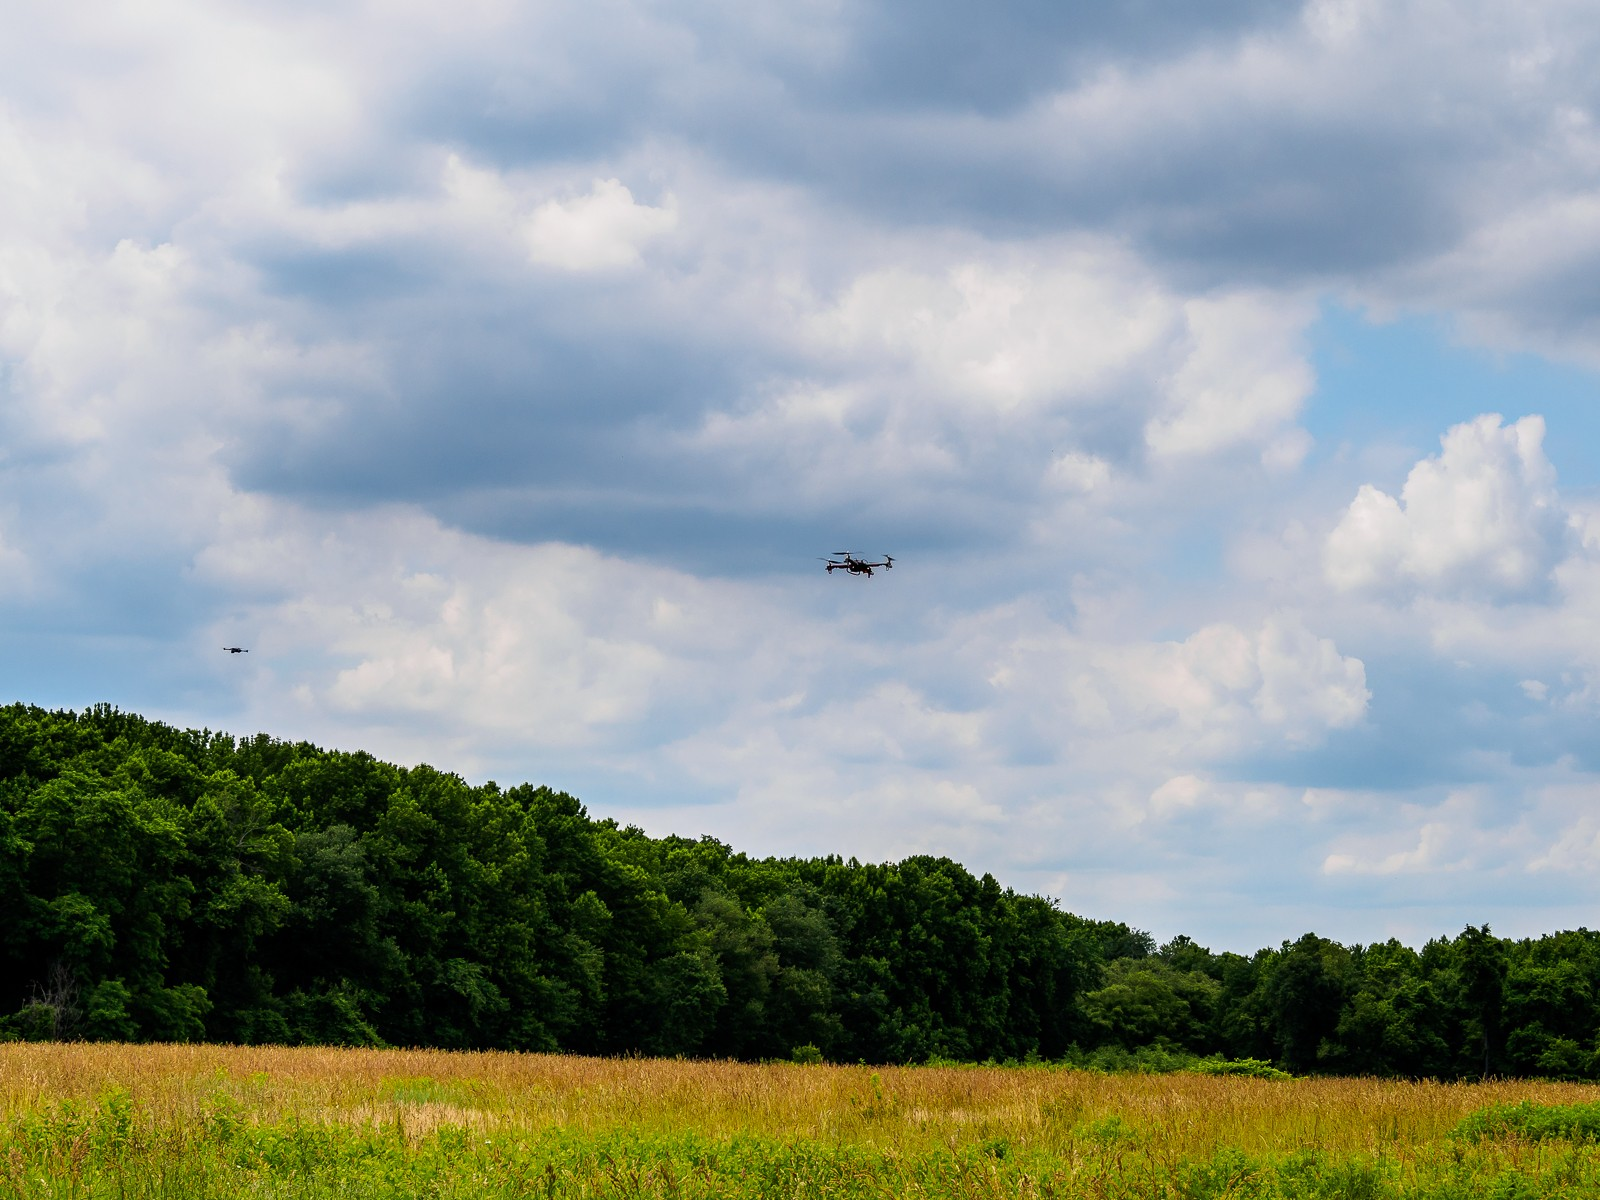 drone-flight-6037-2